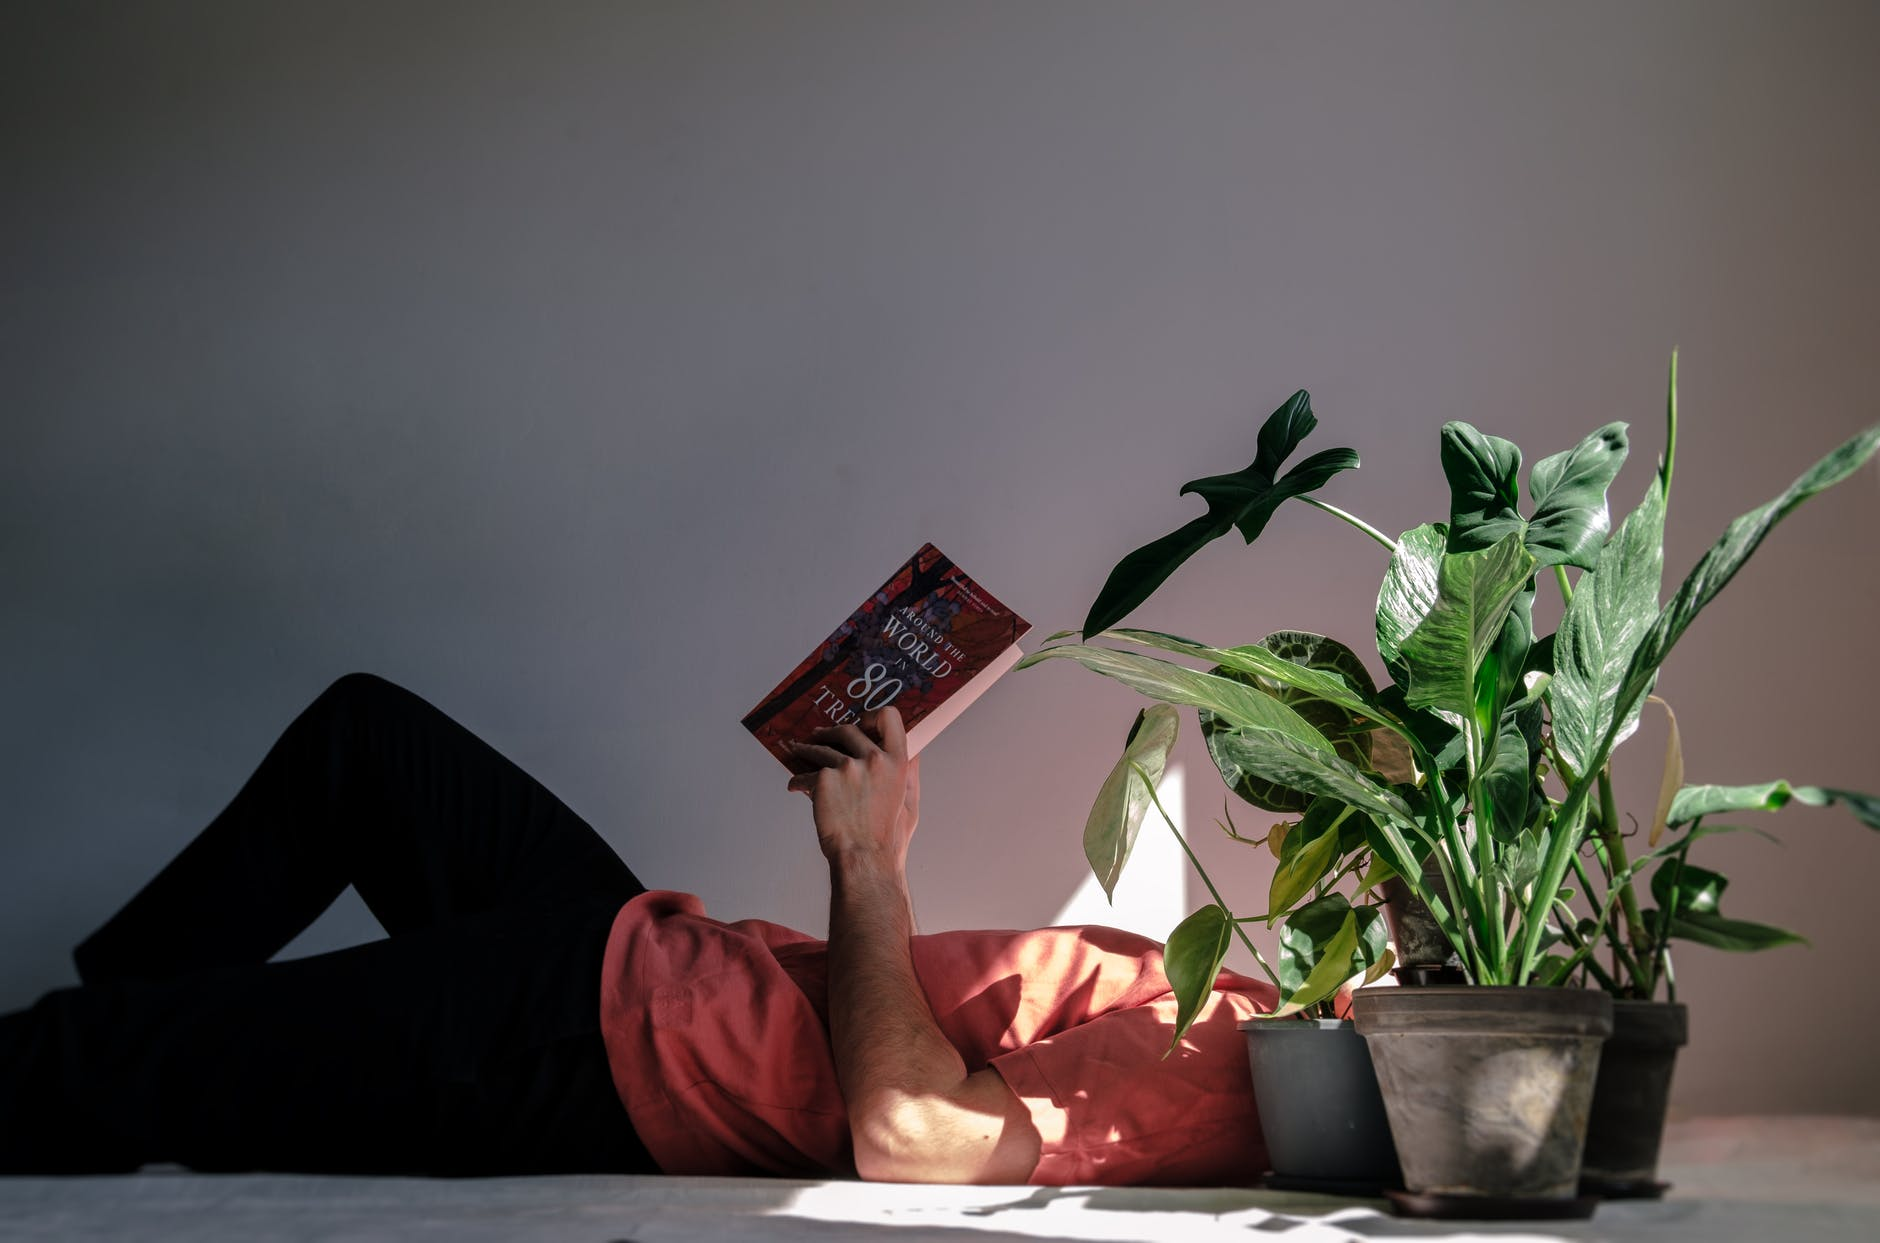 hobbies, cars, plants, yescomusa